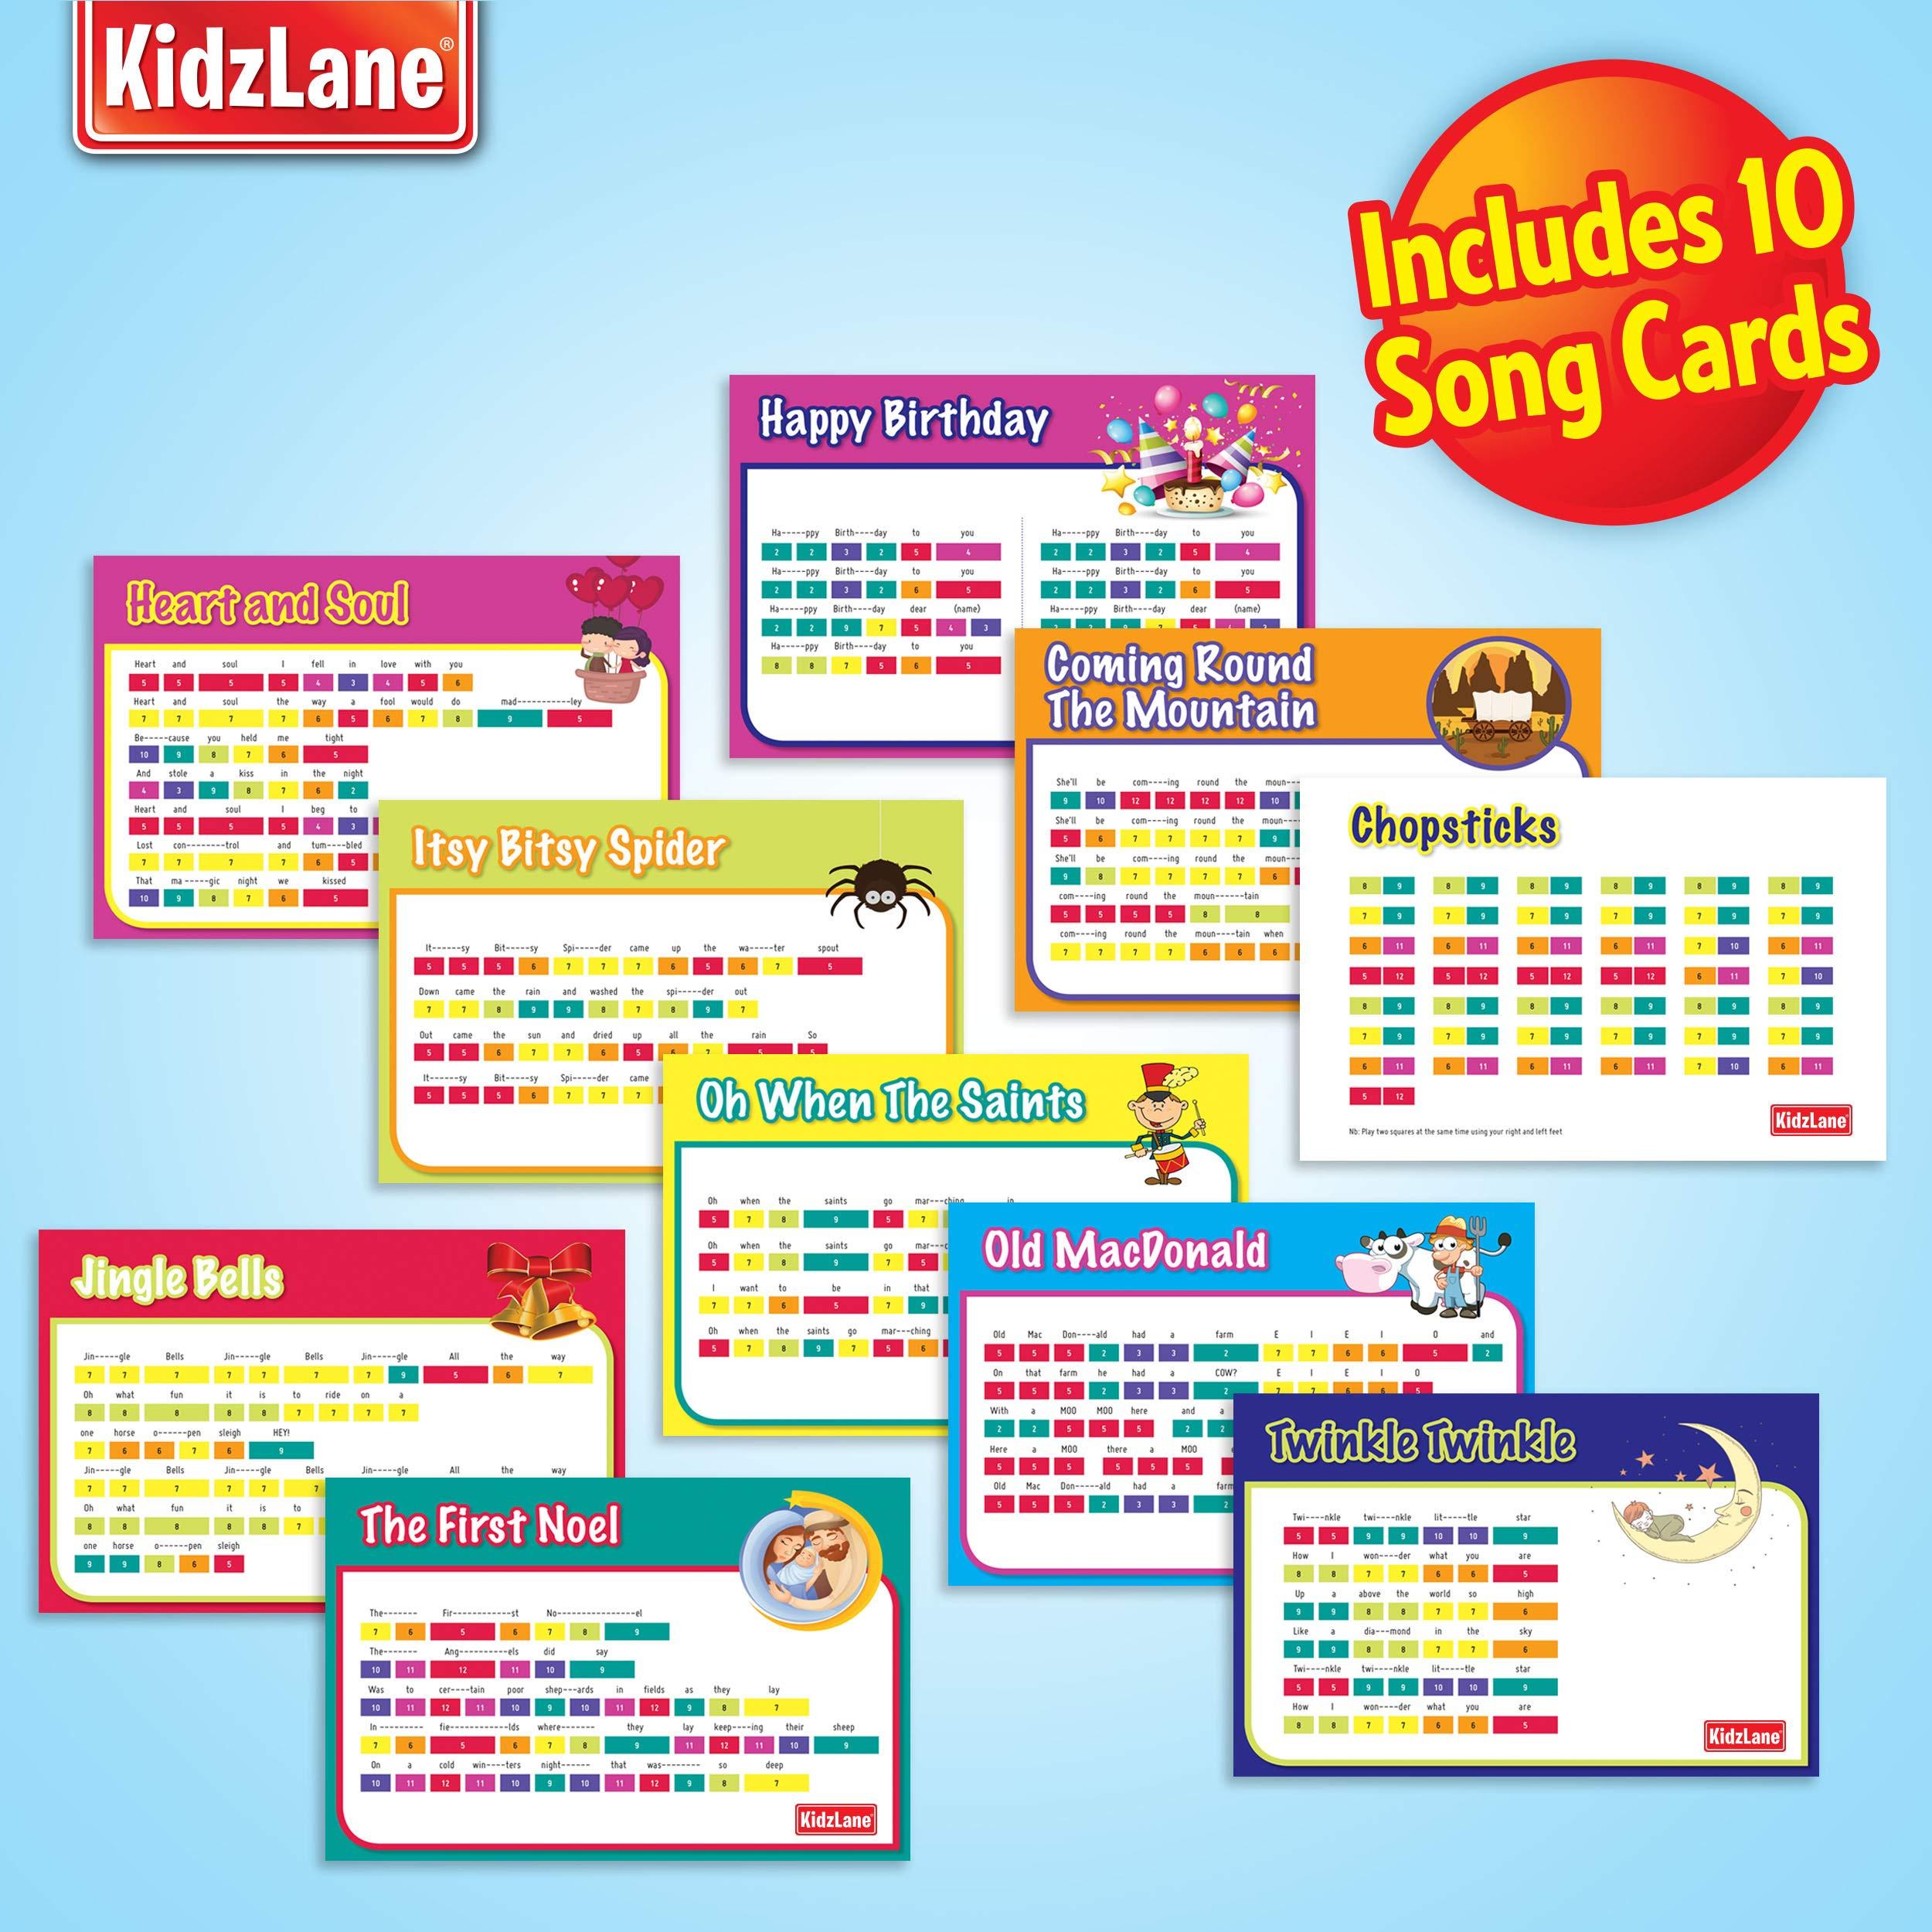 Kidzlane Floor Piano Mat: Jumbo 6 Foot Musical Keyboard Playmat for Toddlers and Kids by Kidzlane (Image #4)